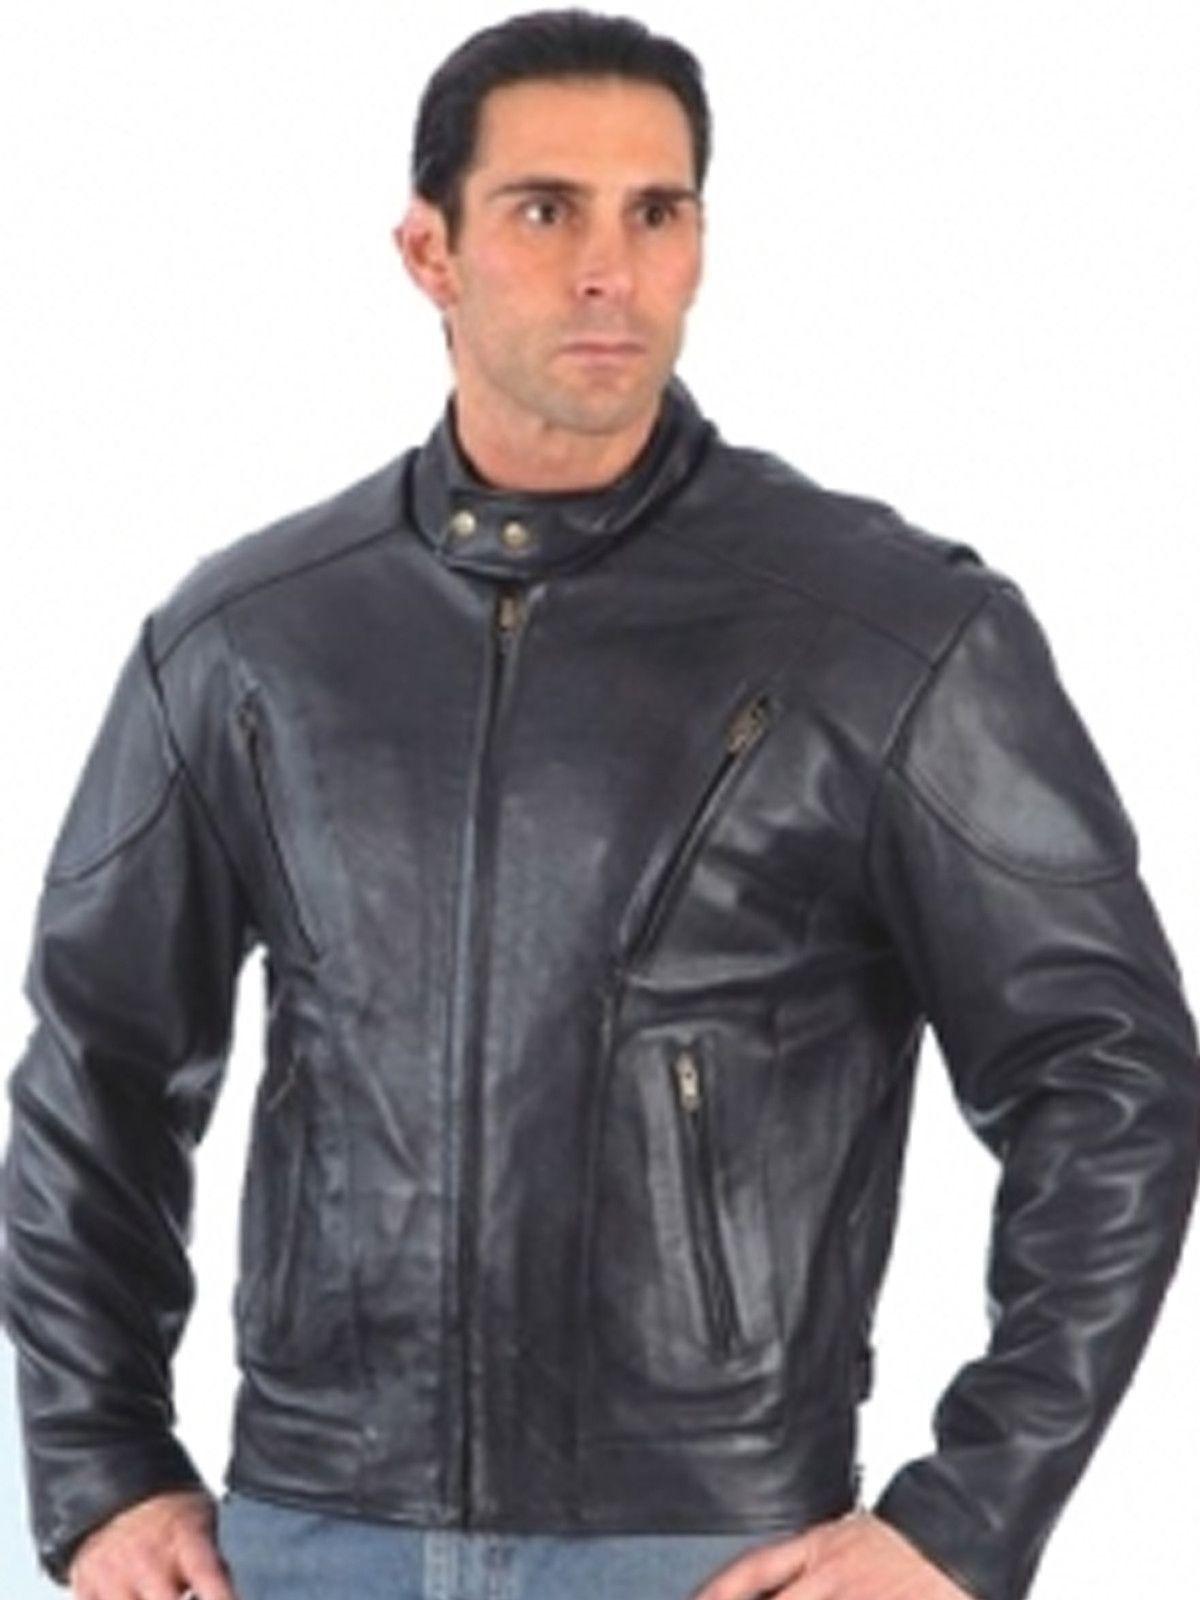 UNIK Men's Big & Tall Black Leather Motorcycle Jacket With